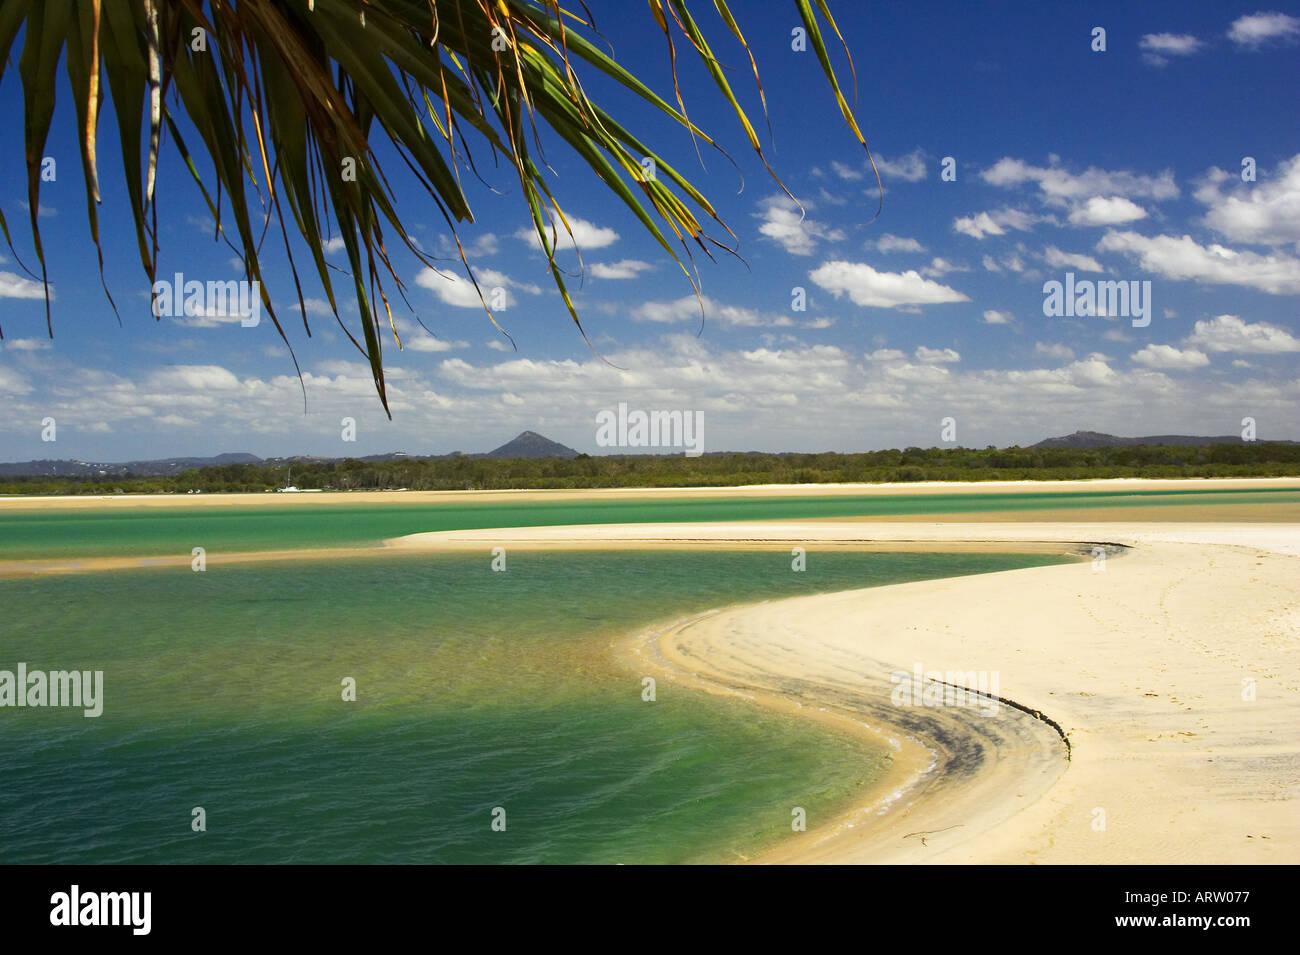 Entrada de Noosa Noosa Heads Sunshine Coast de Queensland, Australia Imagen De Stock